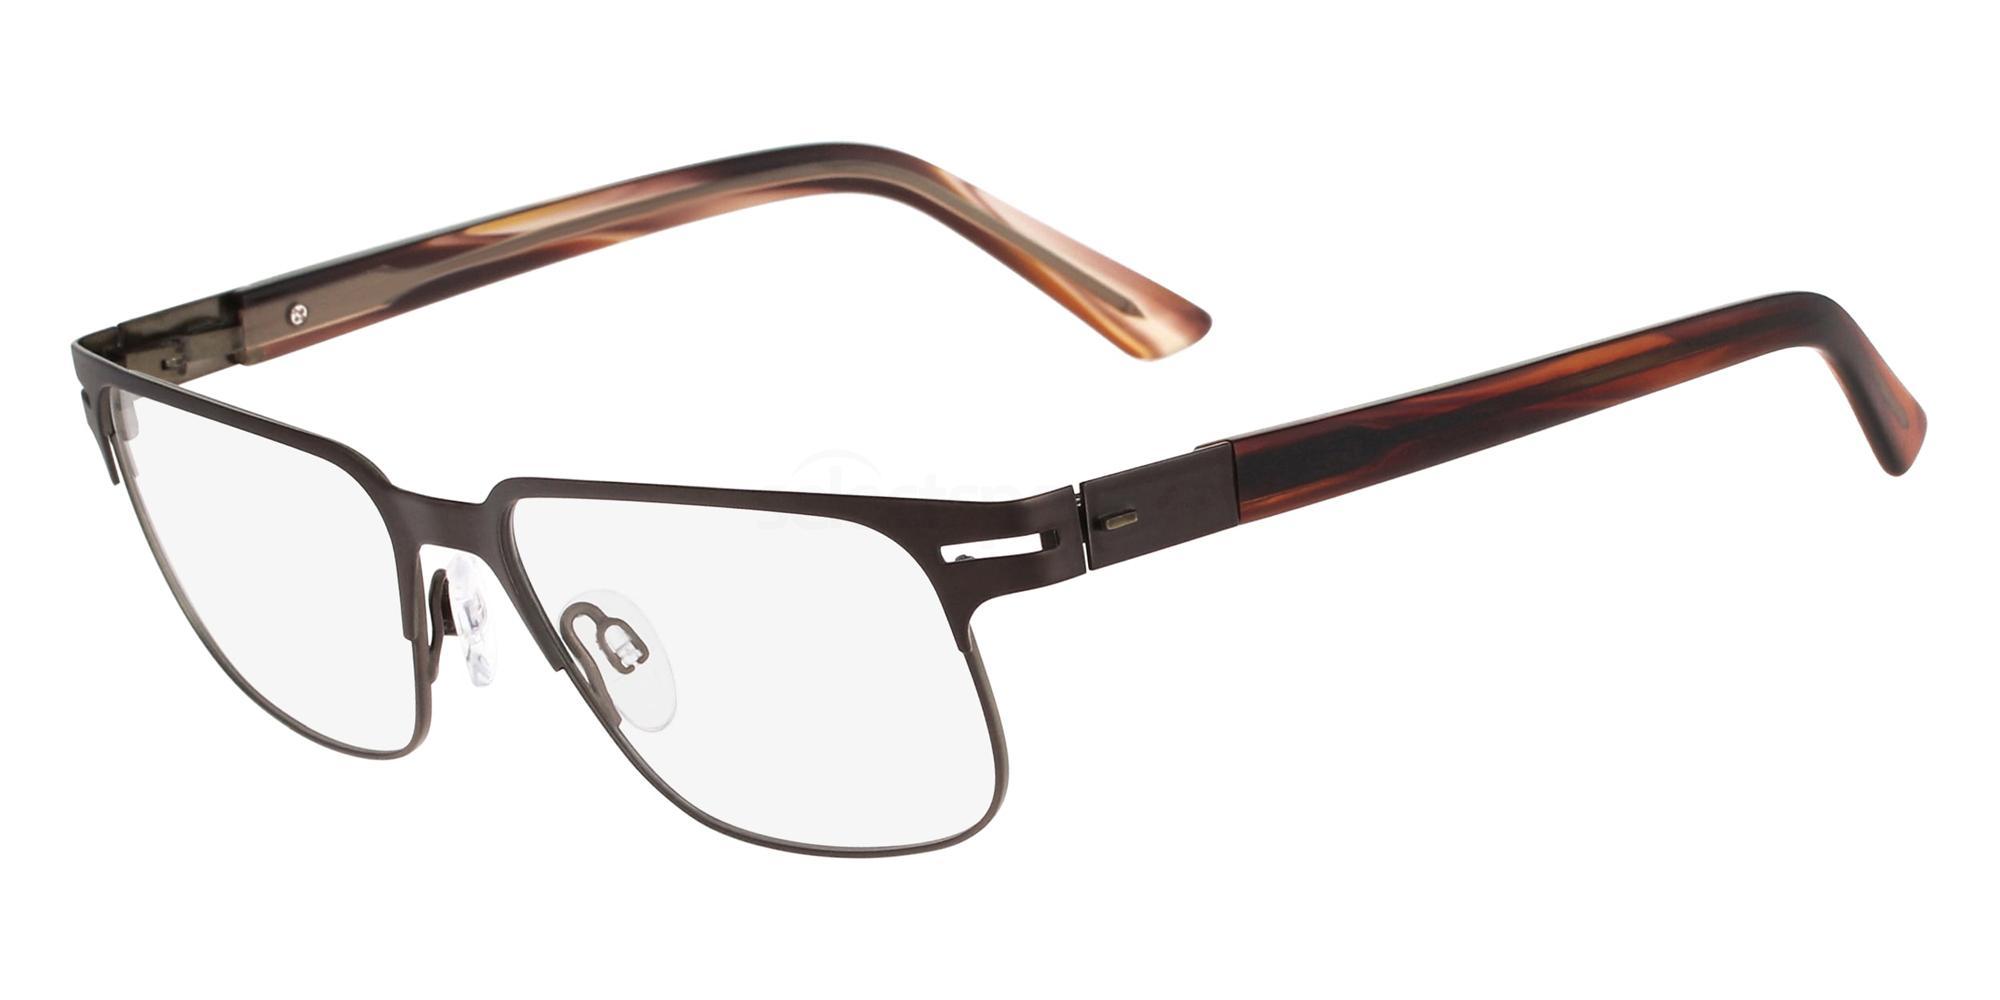 210 2606 SKOGSLIND Glasses, Skaga